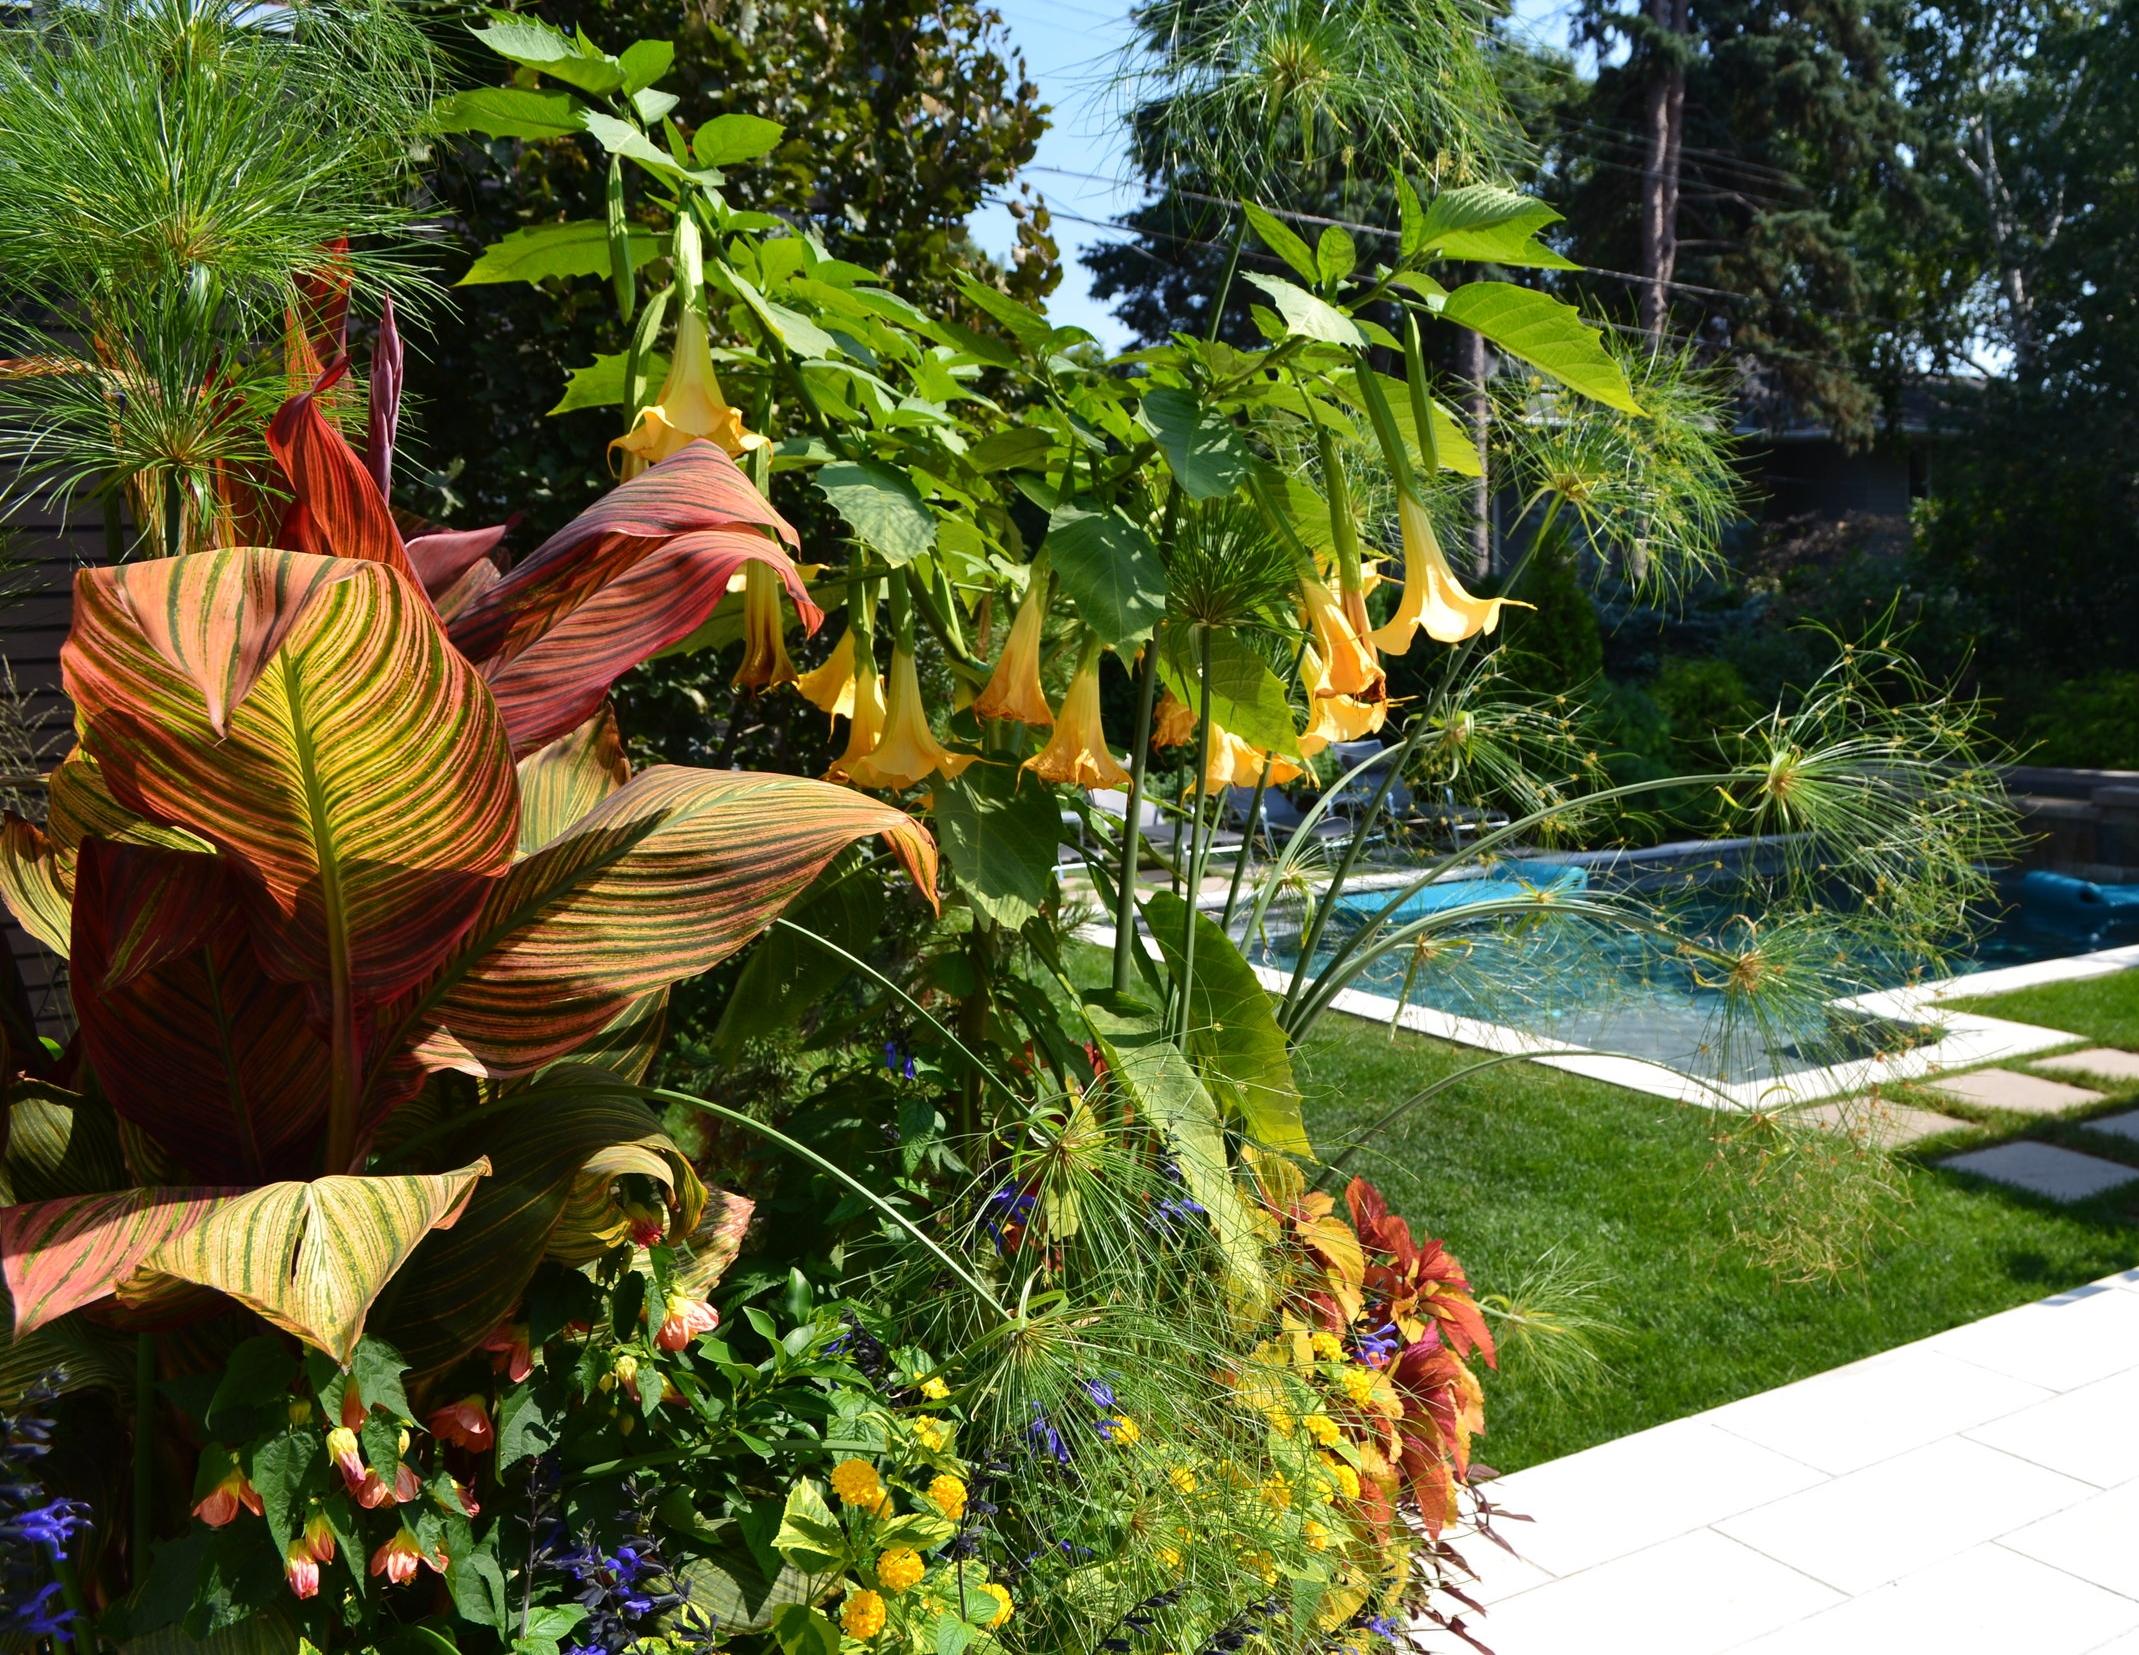 These tropical annuals love full sun -- canna lilies, brugmansia, lantana, etc.